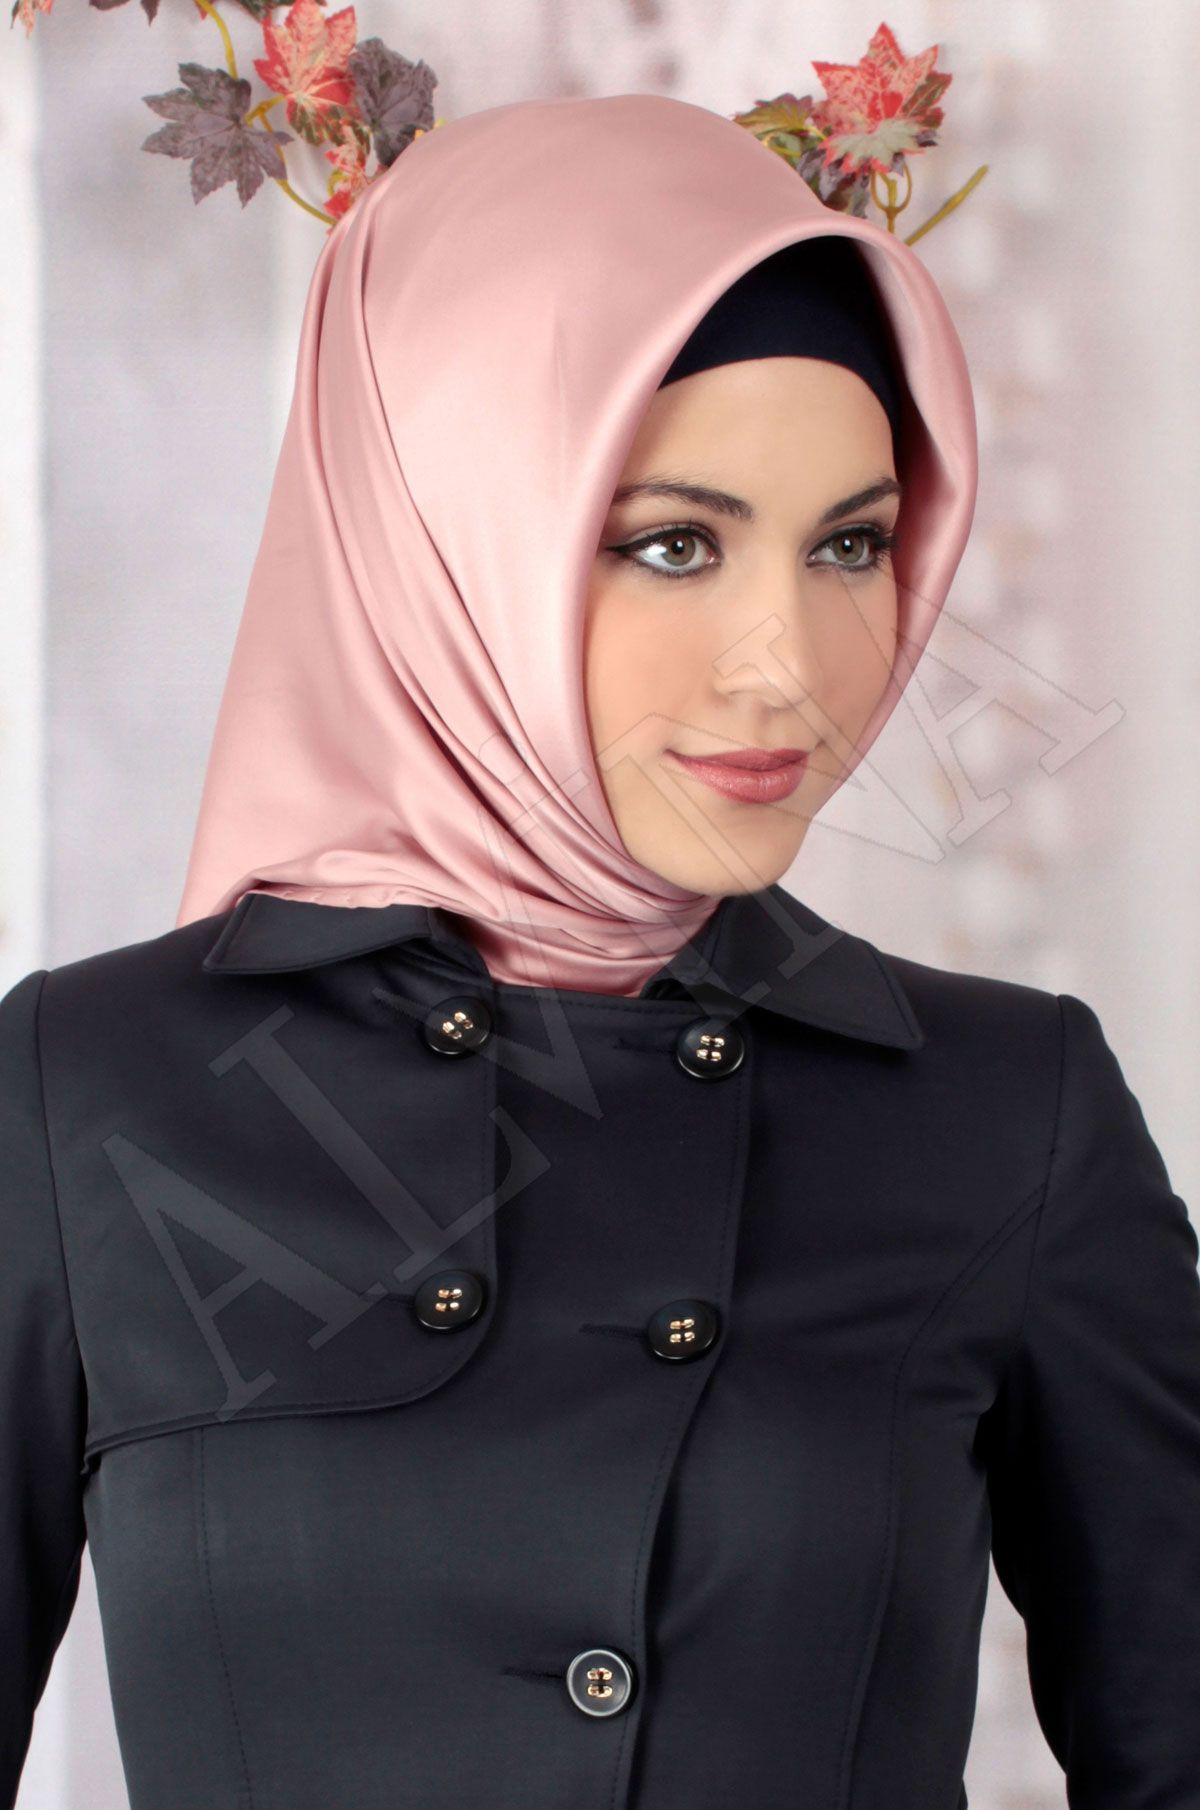 Alvina Online Shopping Hijab Clothing Scarf, Coat, Cap